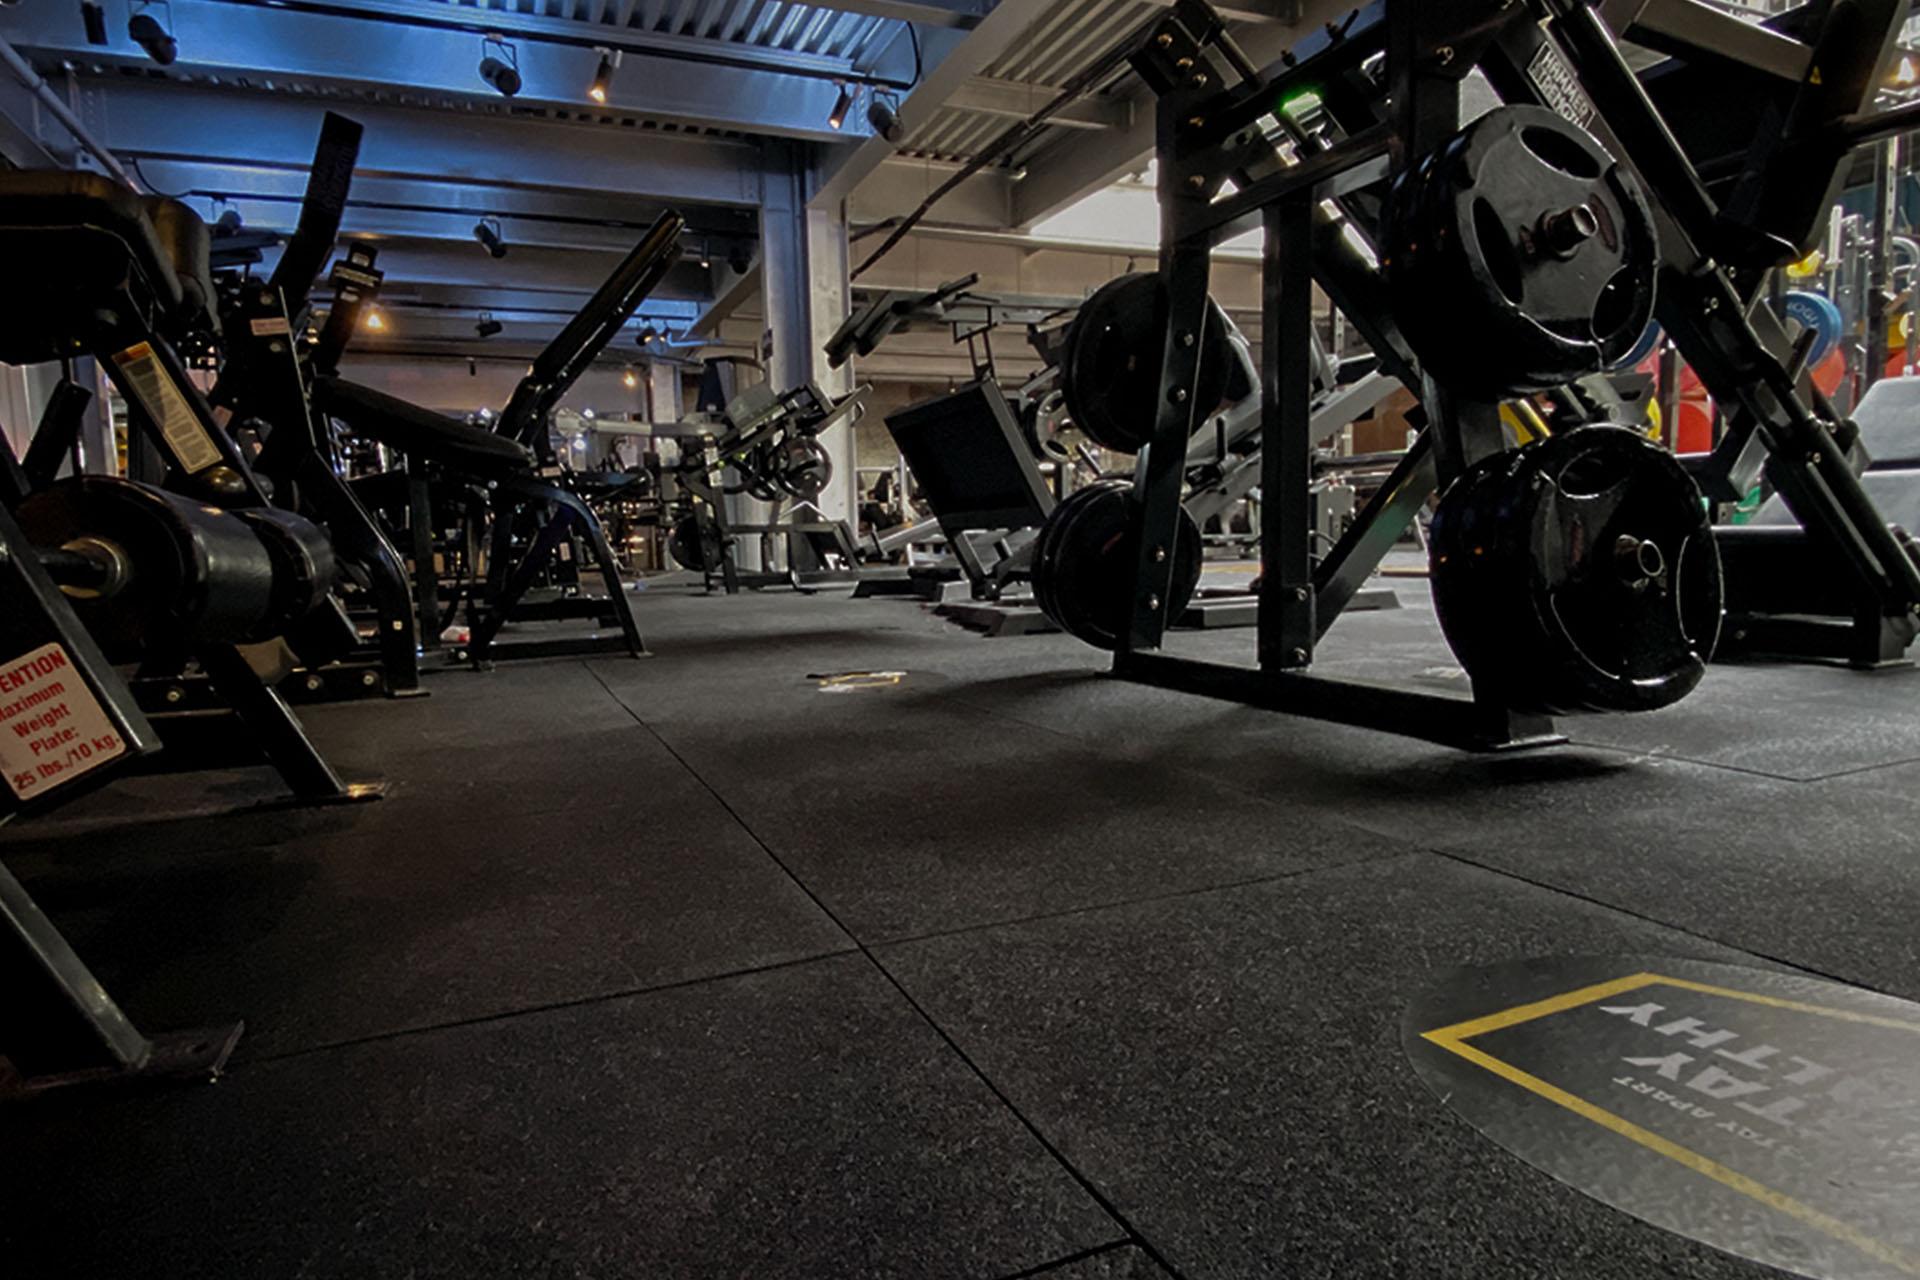 Gym Flooring in Dubai | Gym flooring Abu Dhabi | Rubber flooring UAE | Commercial fitness equipment | UAE Gym design | Dubai Gym design consultation | UAE Fitness equipment | Boxing and MMA equipment | Body composition analysis in Dubai | Functional Fitness Functional Fitness Supply BUILD YOUR GYM